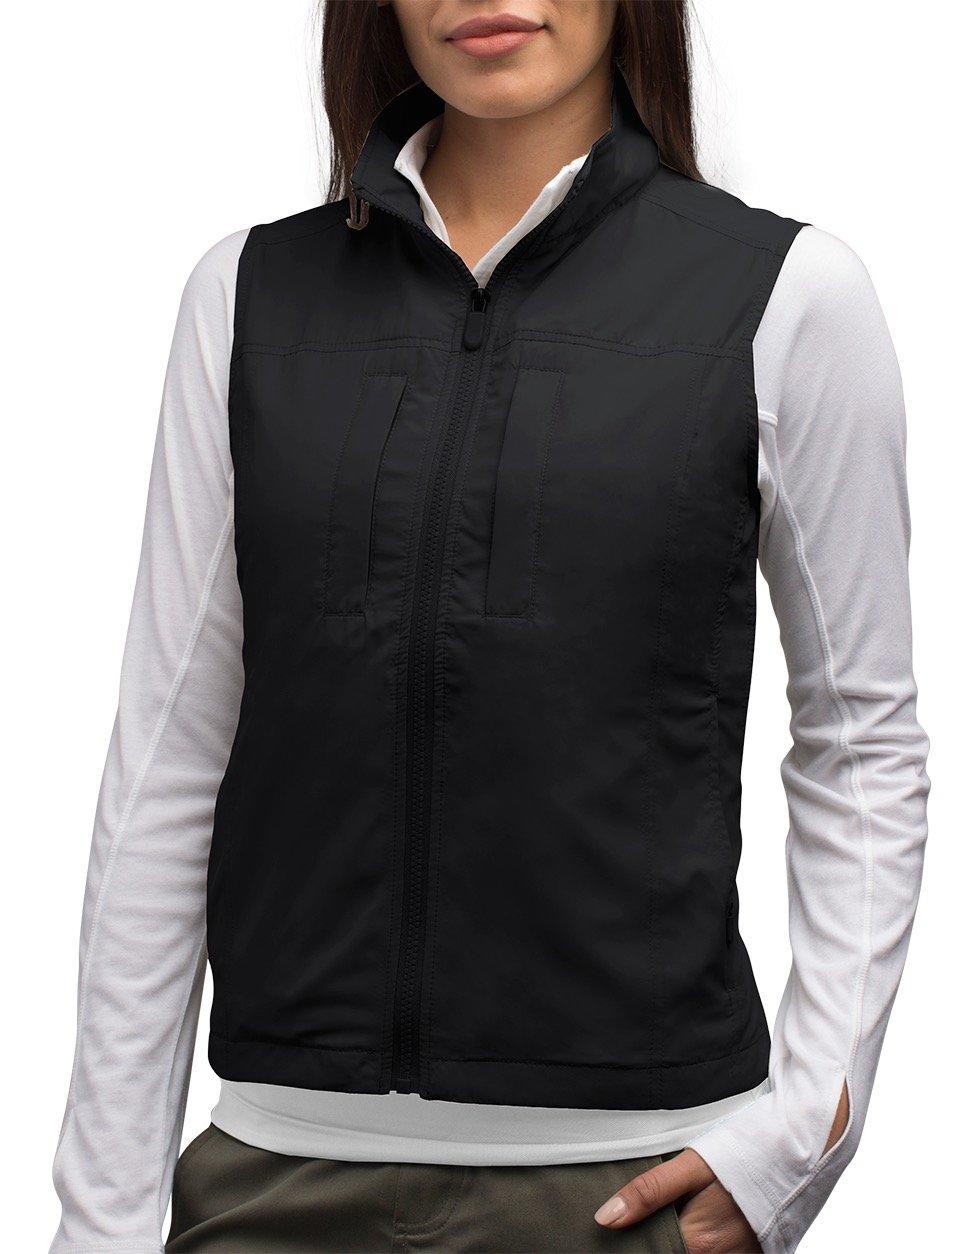 SCOTTeVEST Women's Featherweight Vest Blk S - 14 Pockets - Travel Clothing